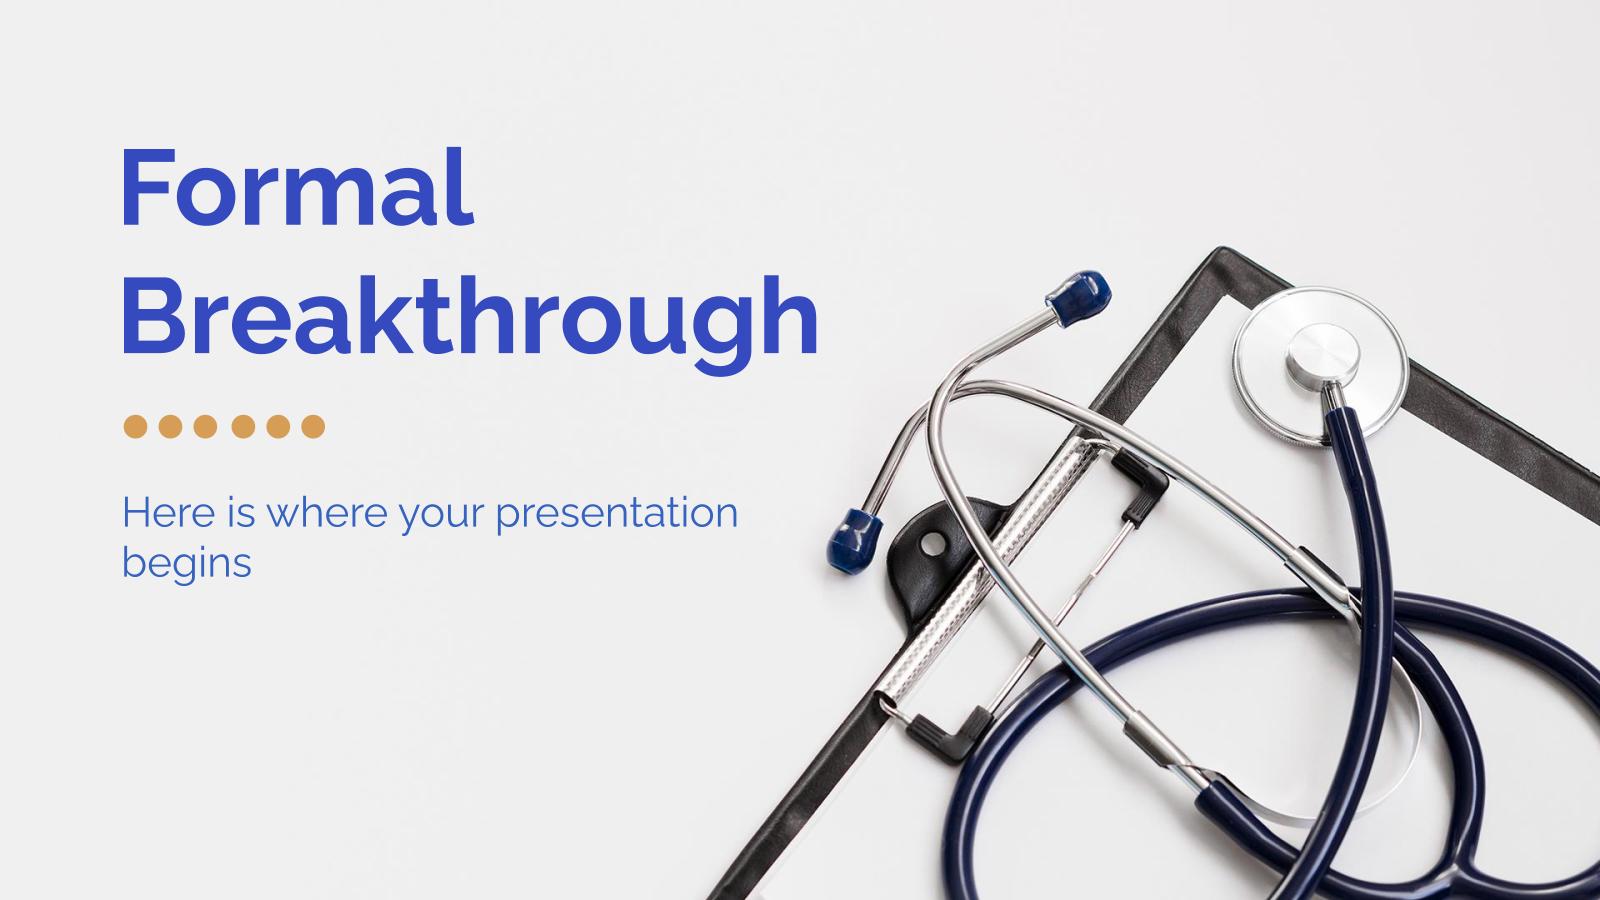 Formal Breakthrough presentation template